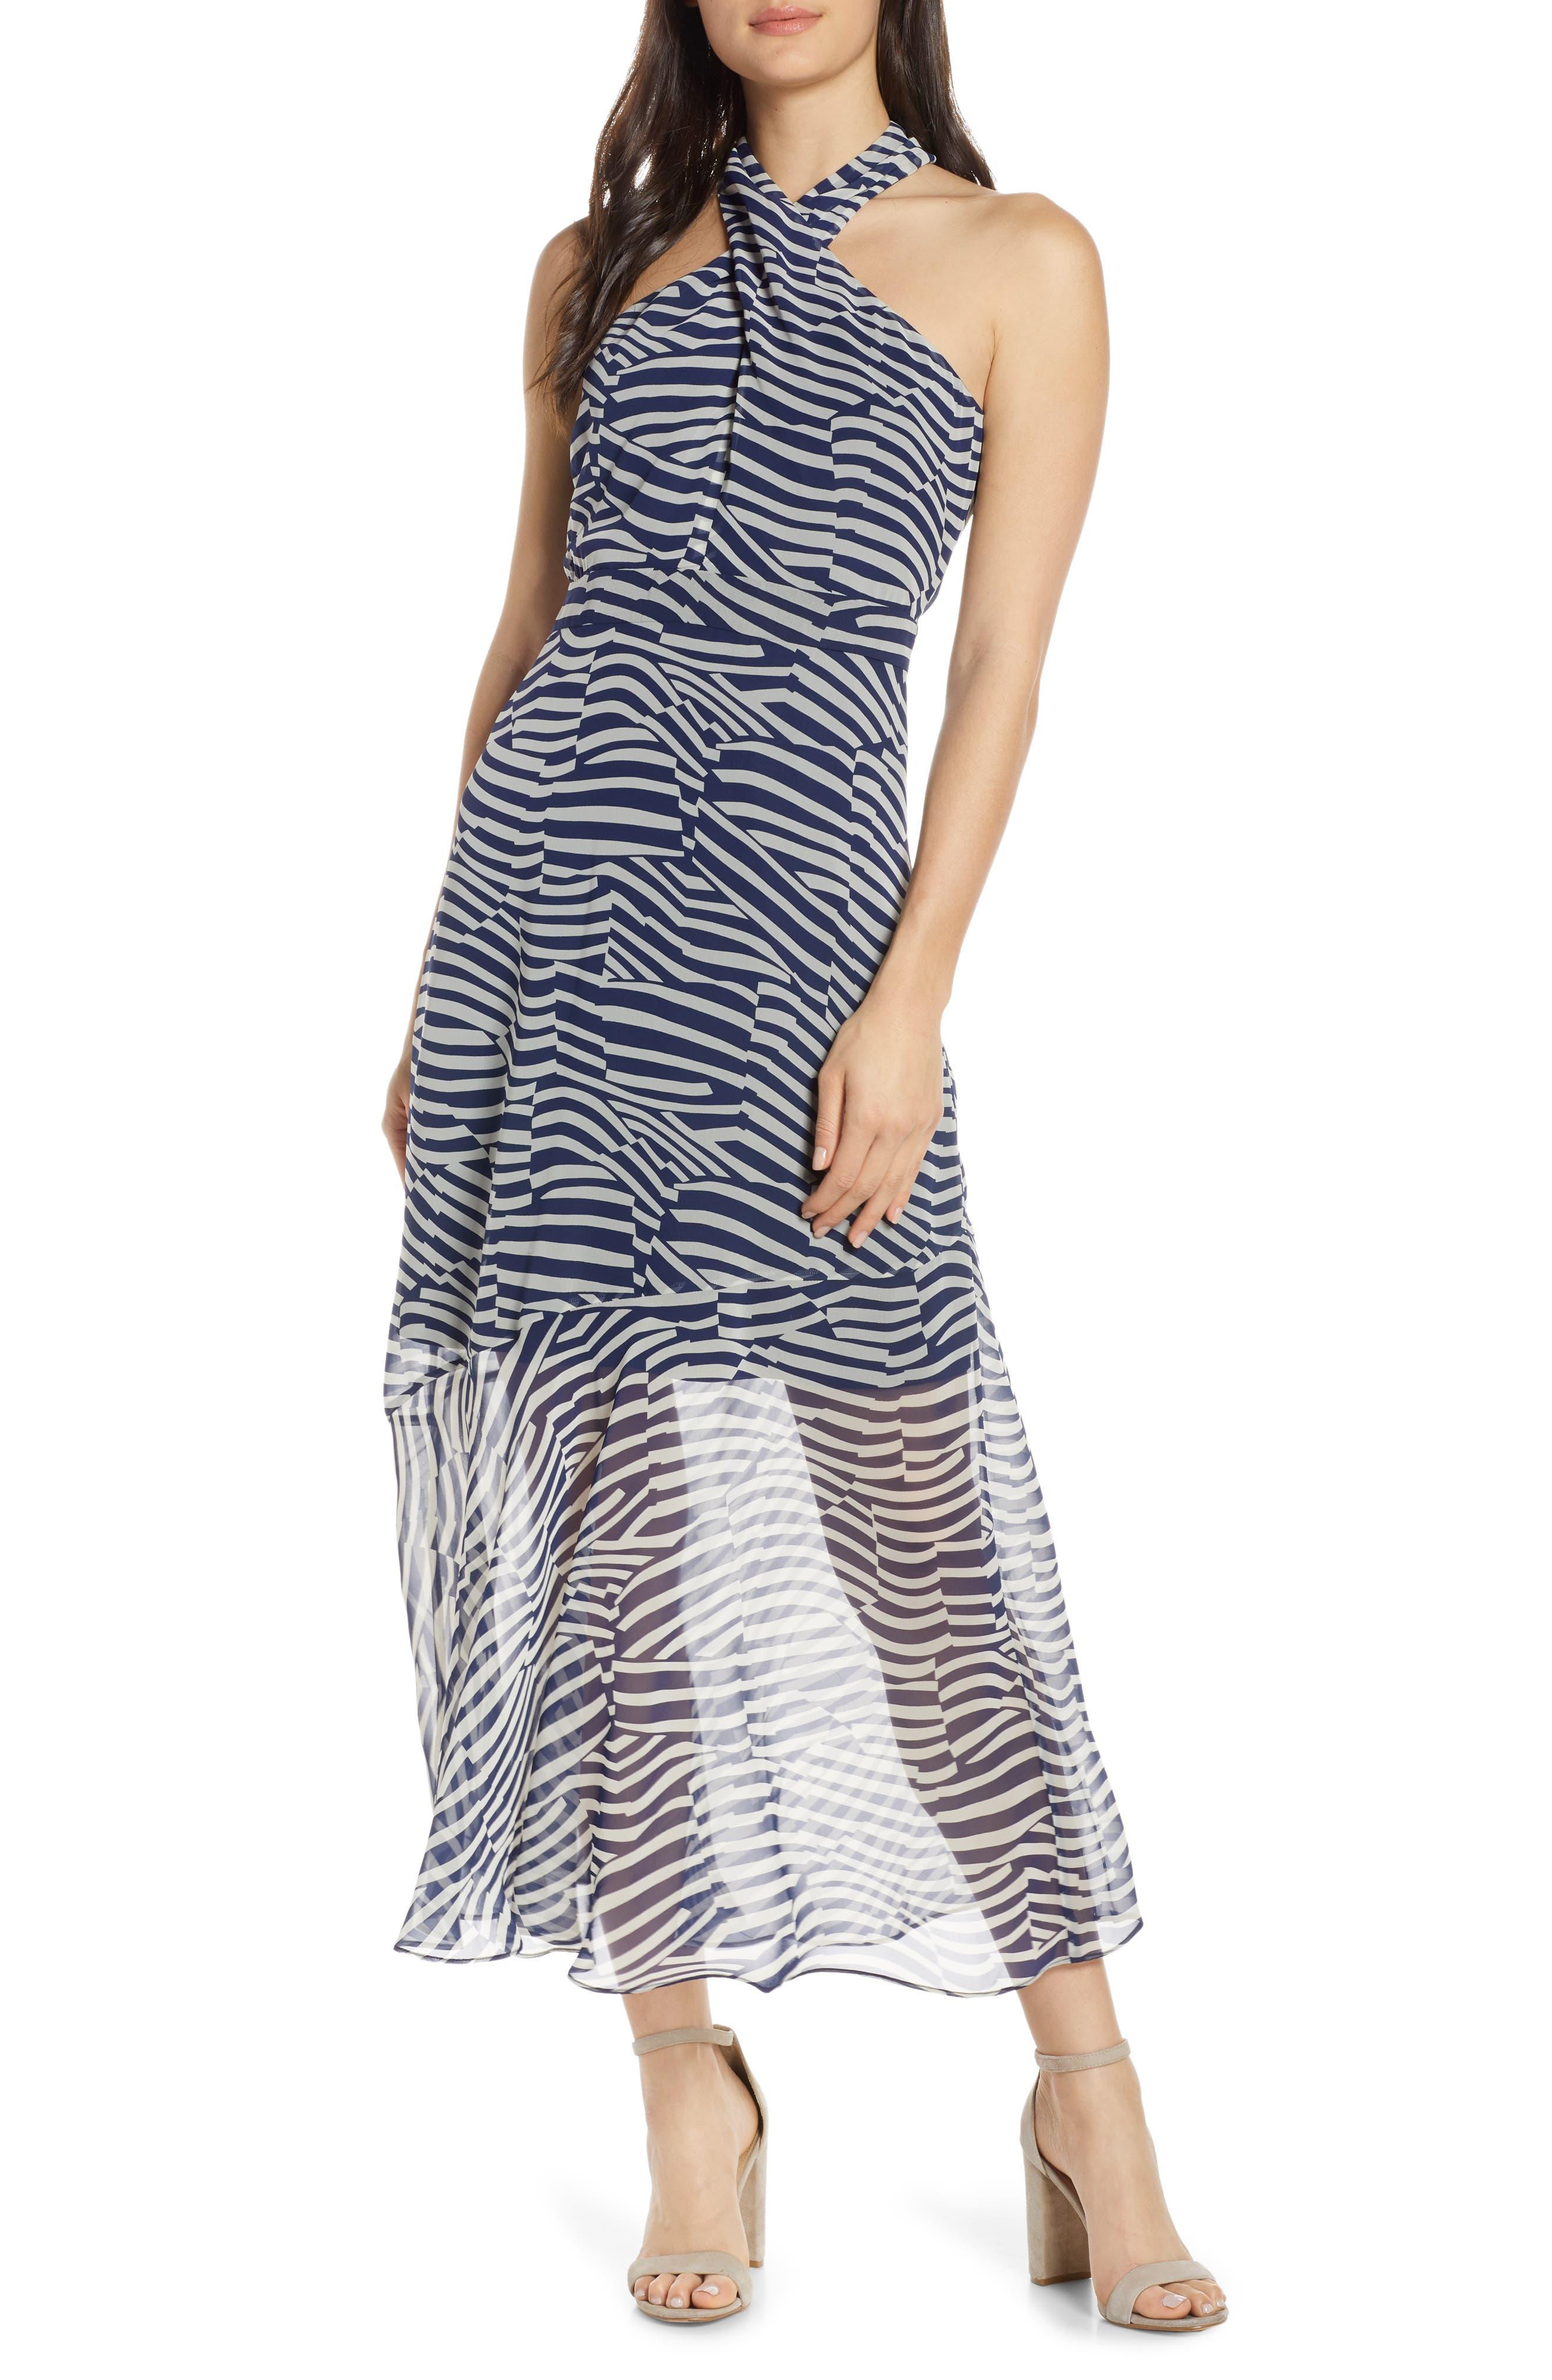 Sam Edelman Patchwork Stripe Print Chiffon Halter Dress, Blue